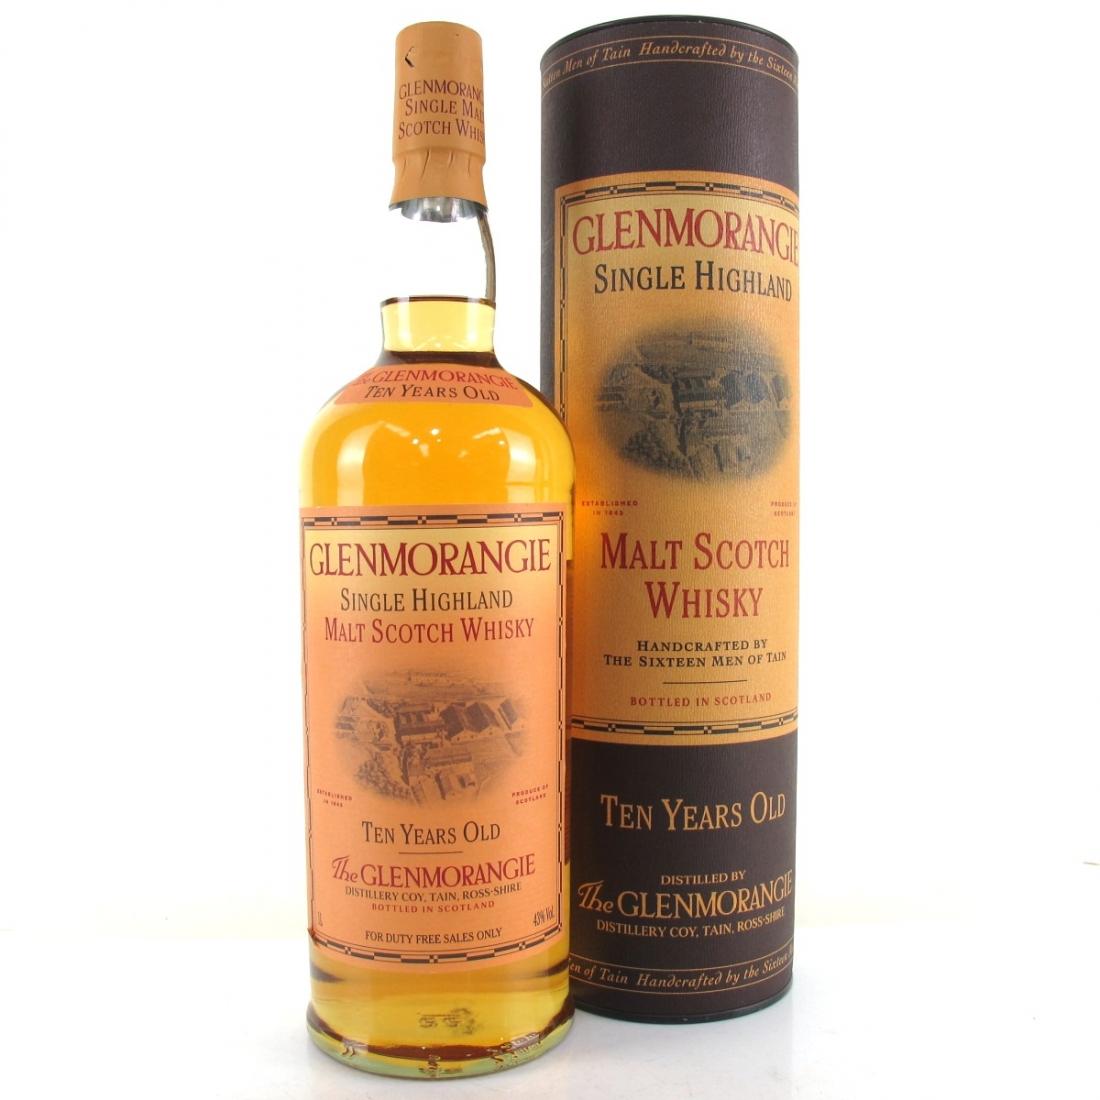 Glenmorangie 10 Year Old 1 Litre